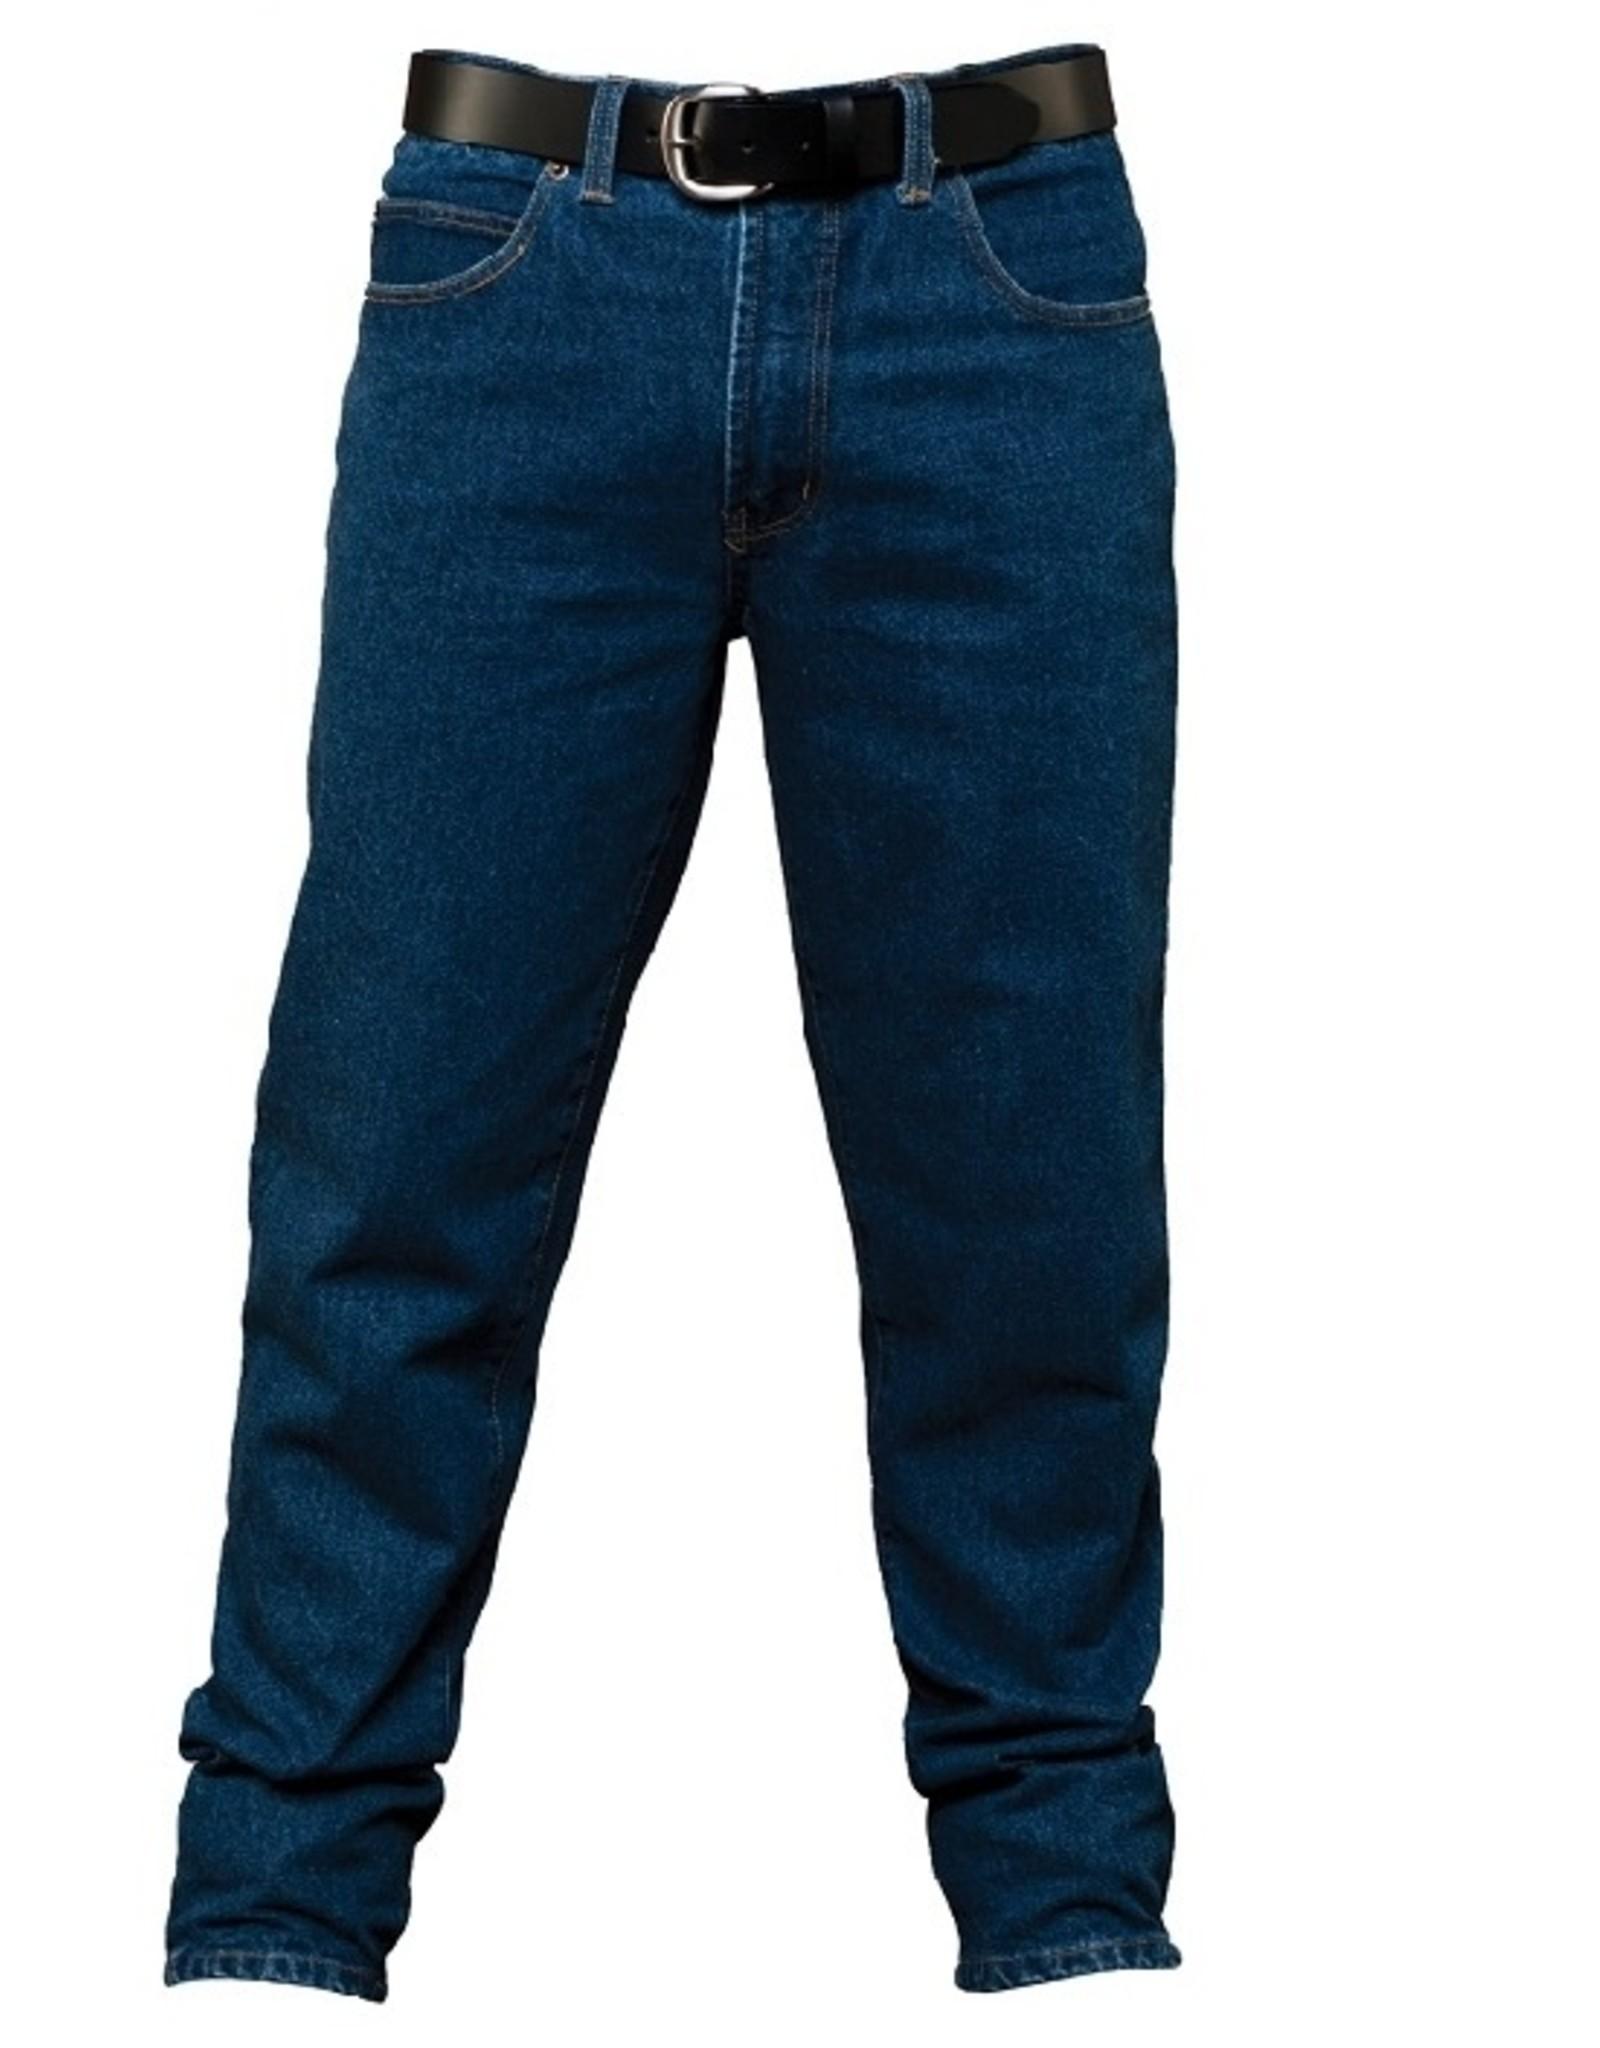 Ritemate Ritemate RM1010SD Men's Stretch Denim Jeans